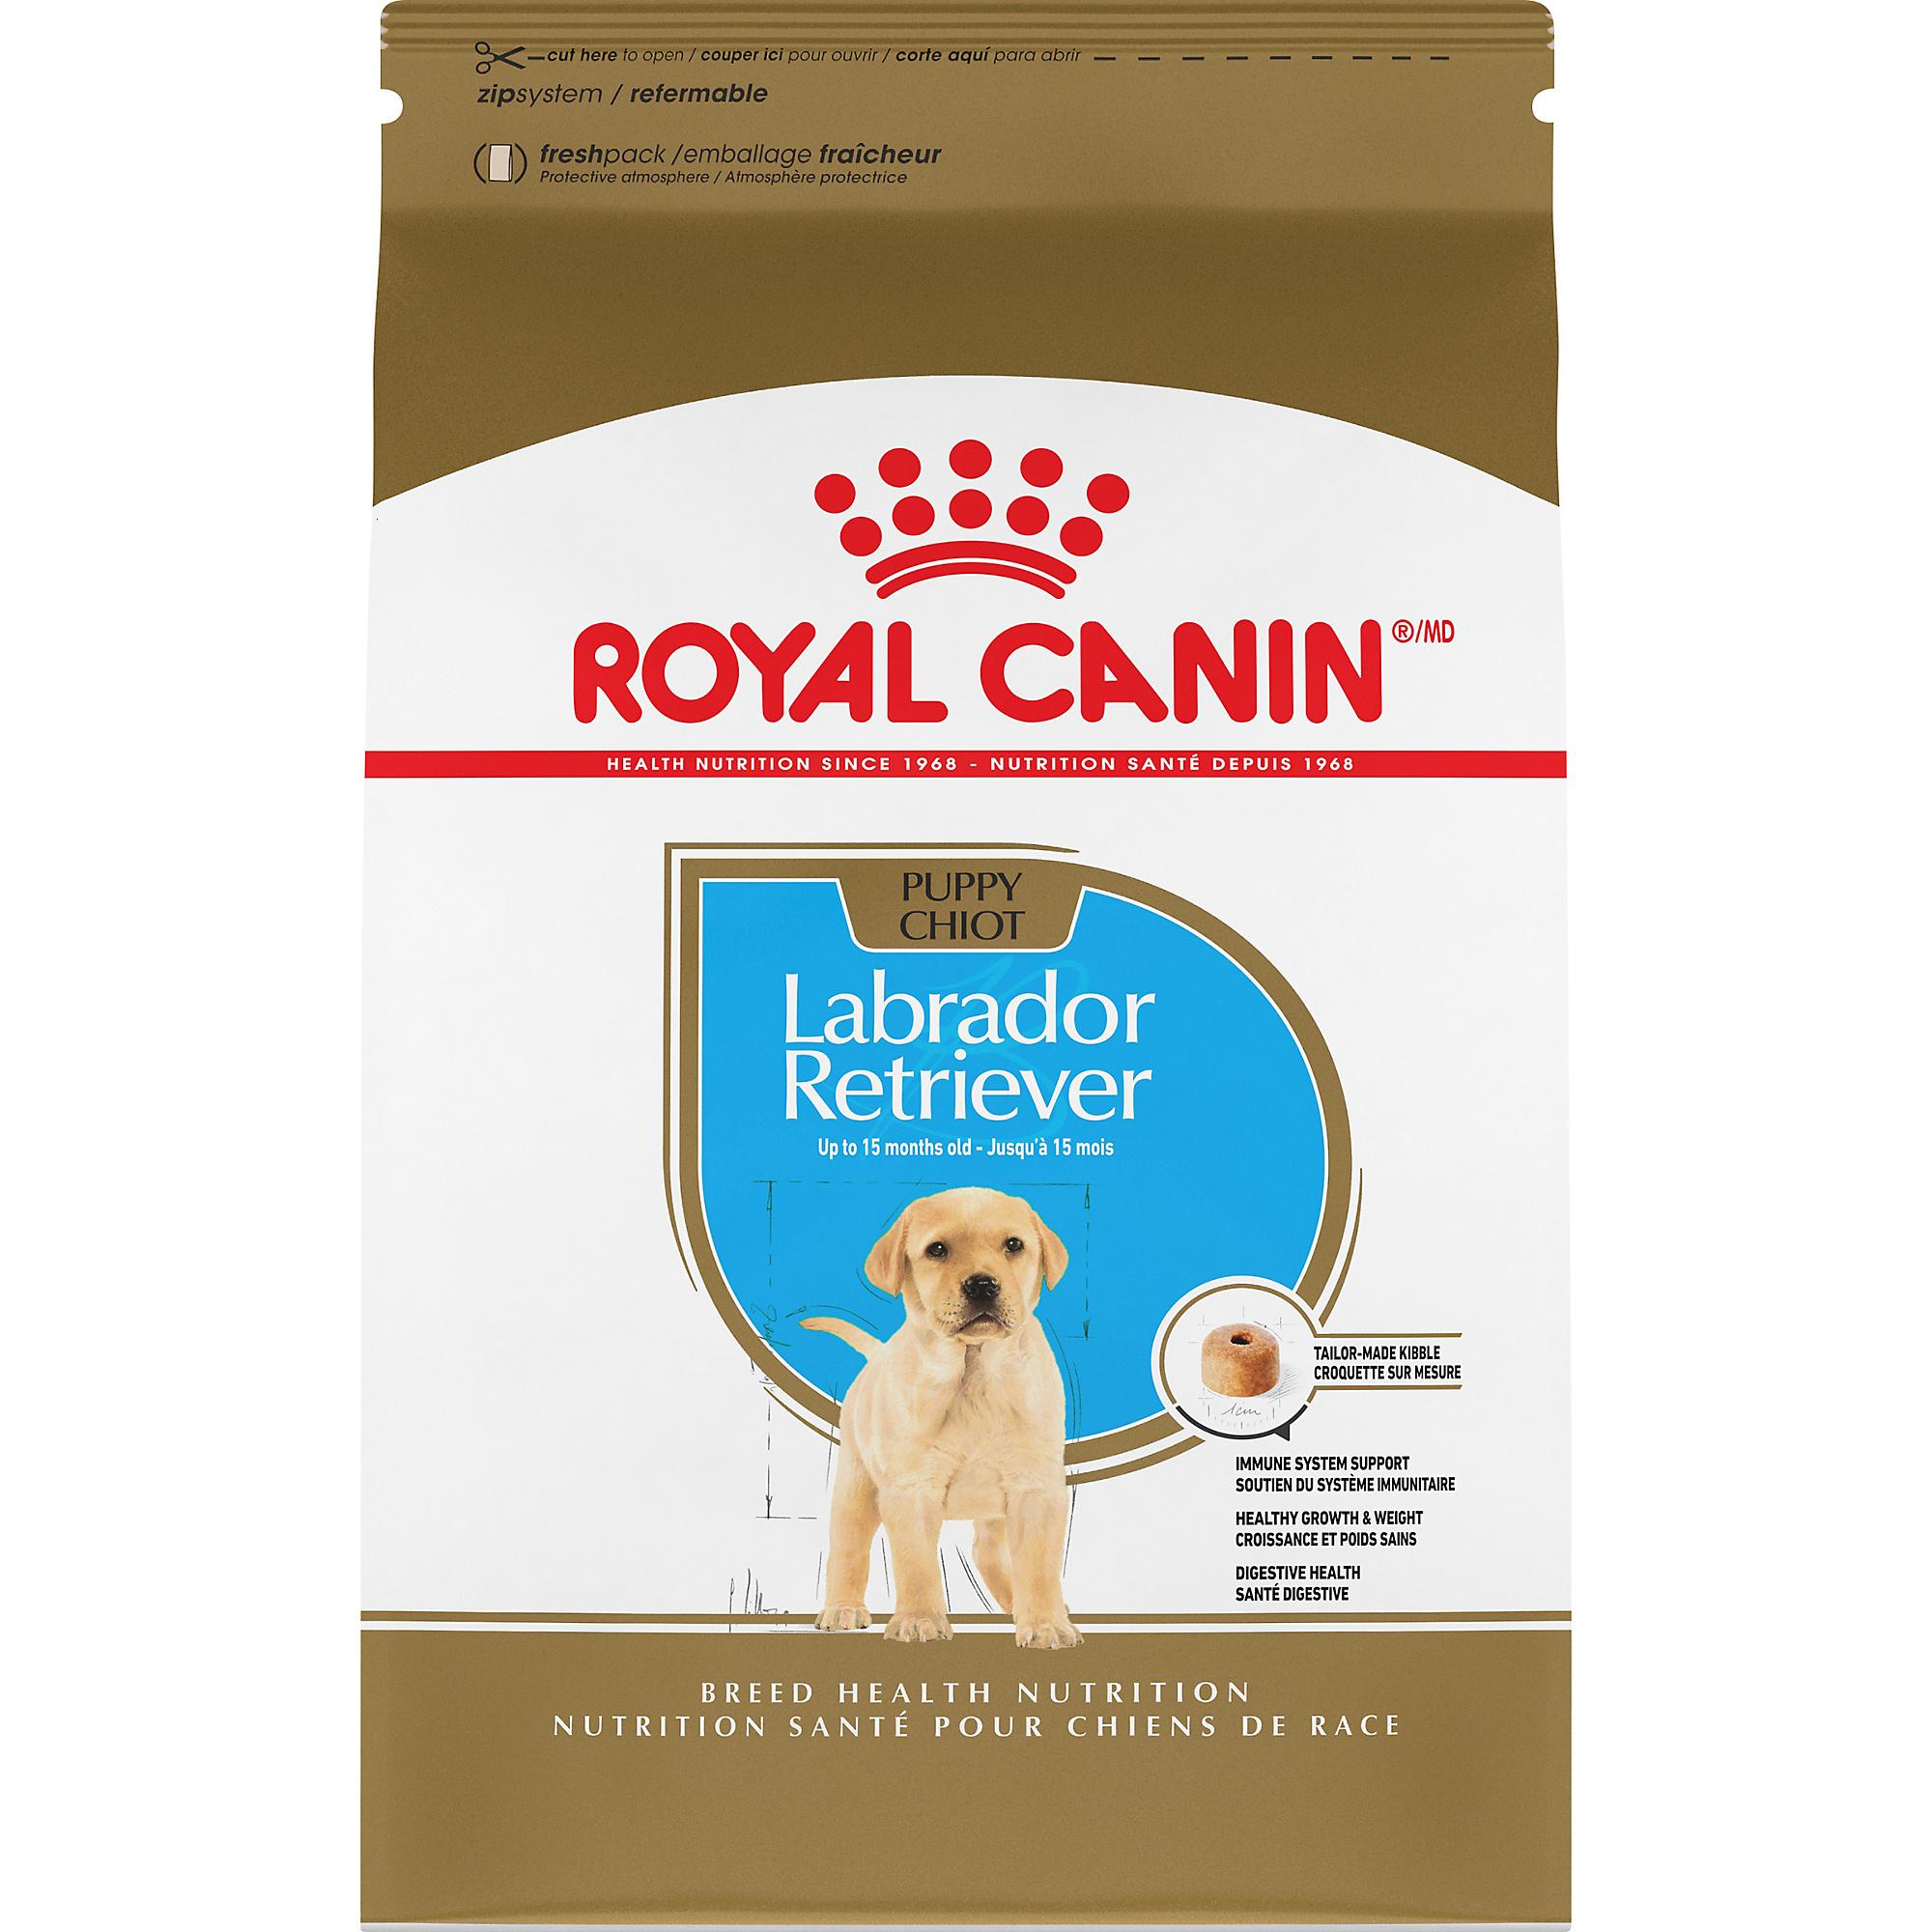 Royal Canin Breed Health Nutrition Labrador Retriever Puppy Dry Dog Food Image